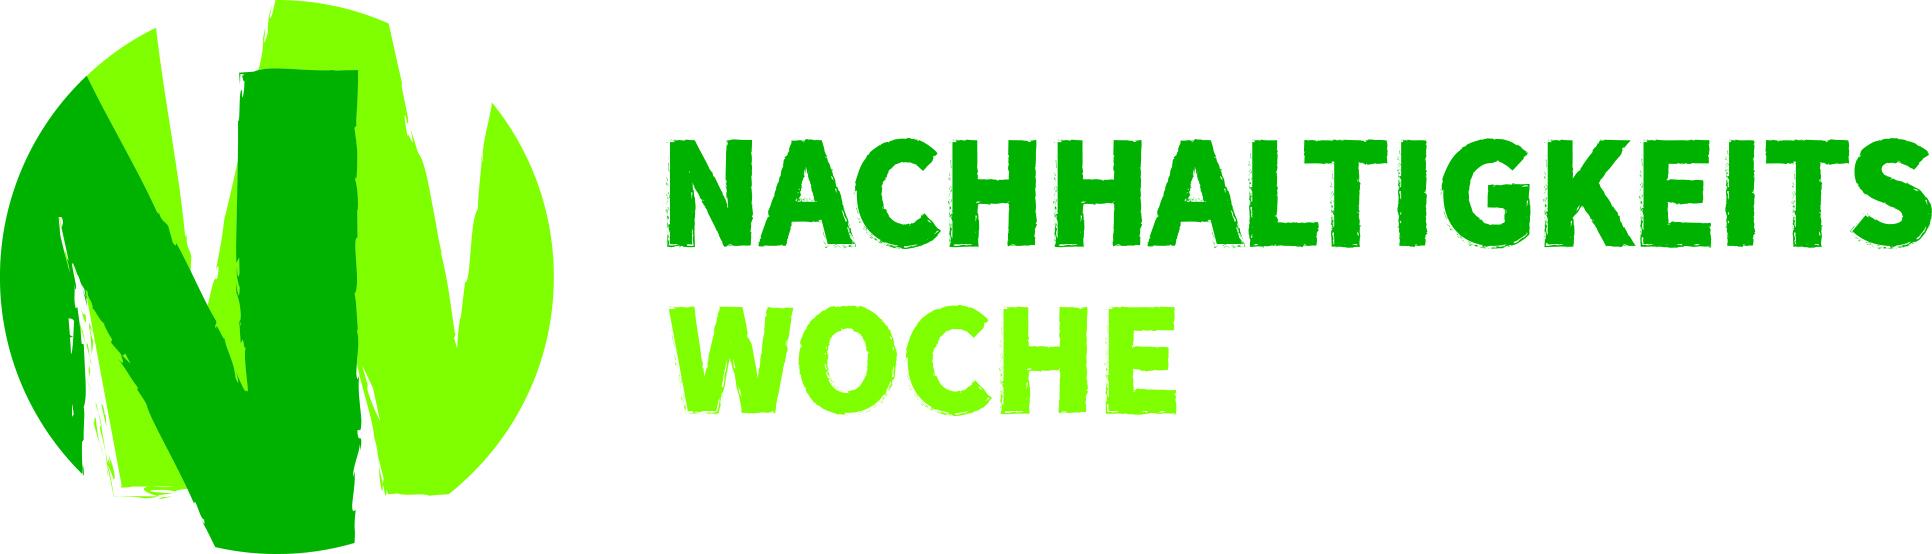 Kochshow logo  Kochshow Logo | kochkor.info